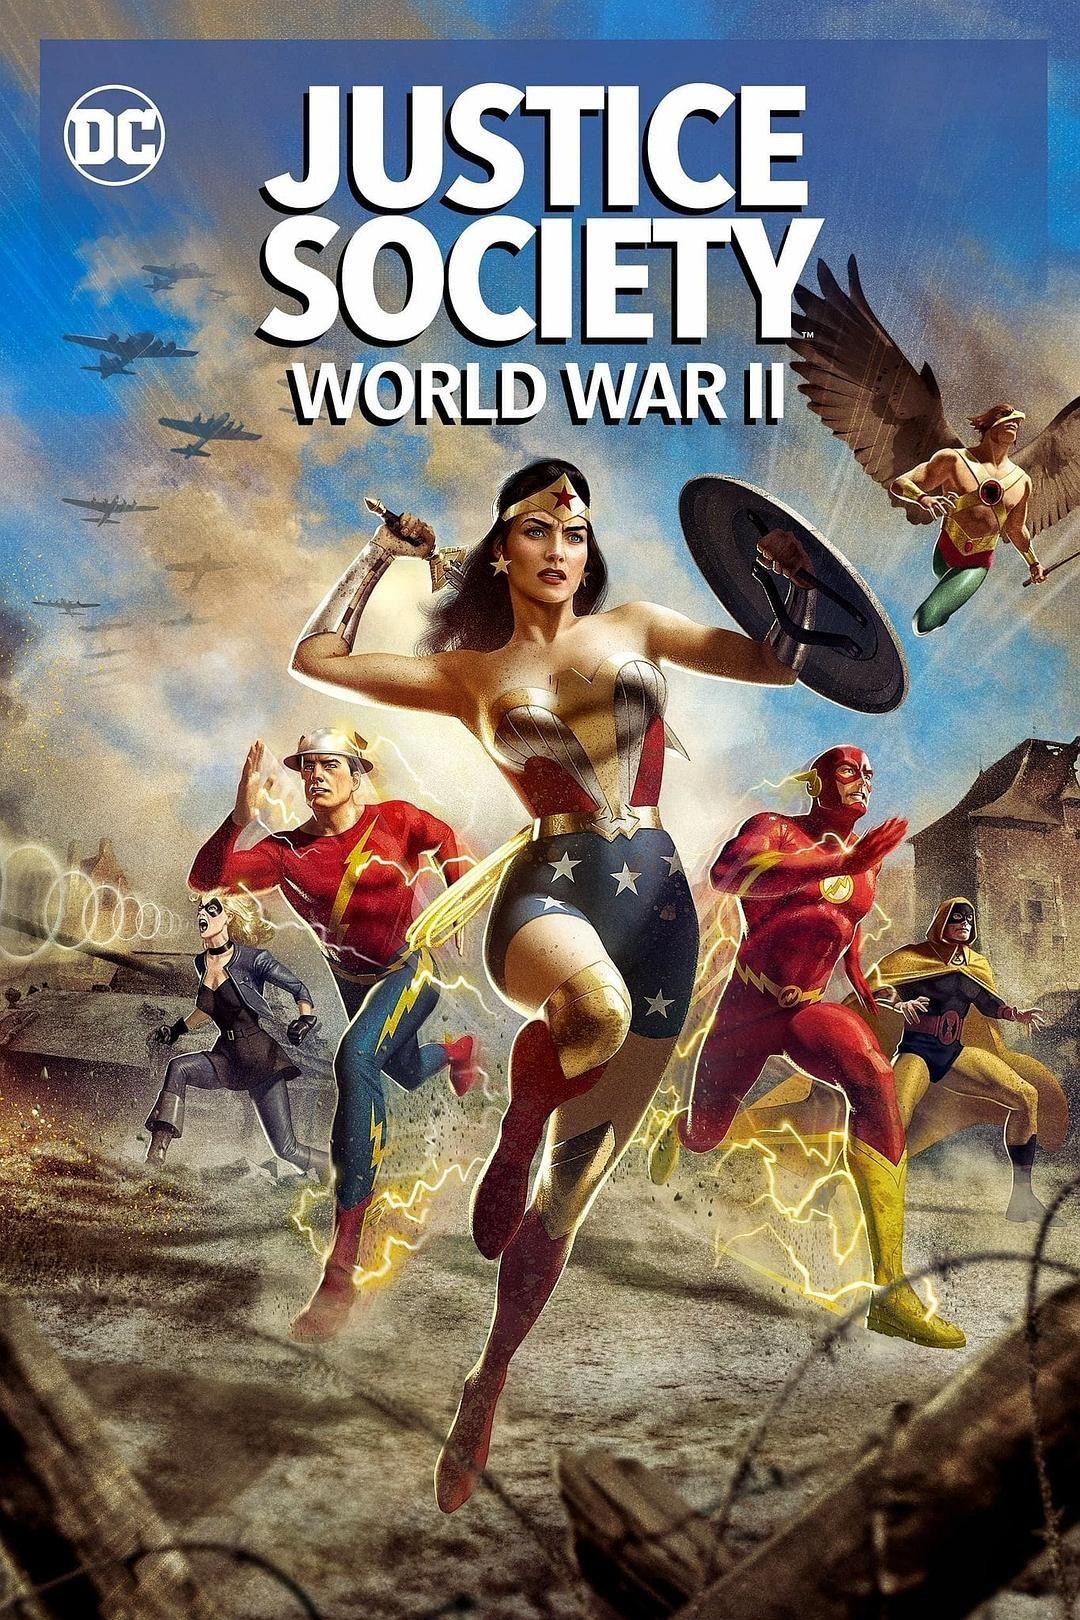 2021DC动画《正义协会:二战》高清1080P